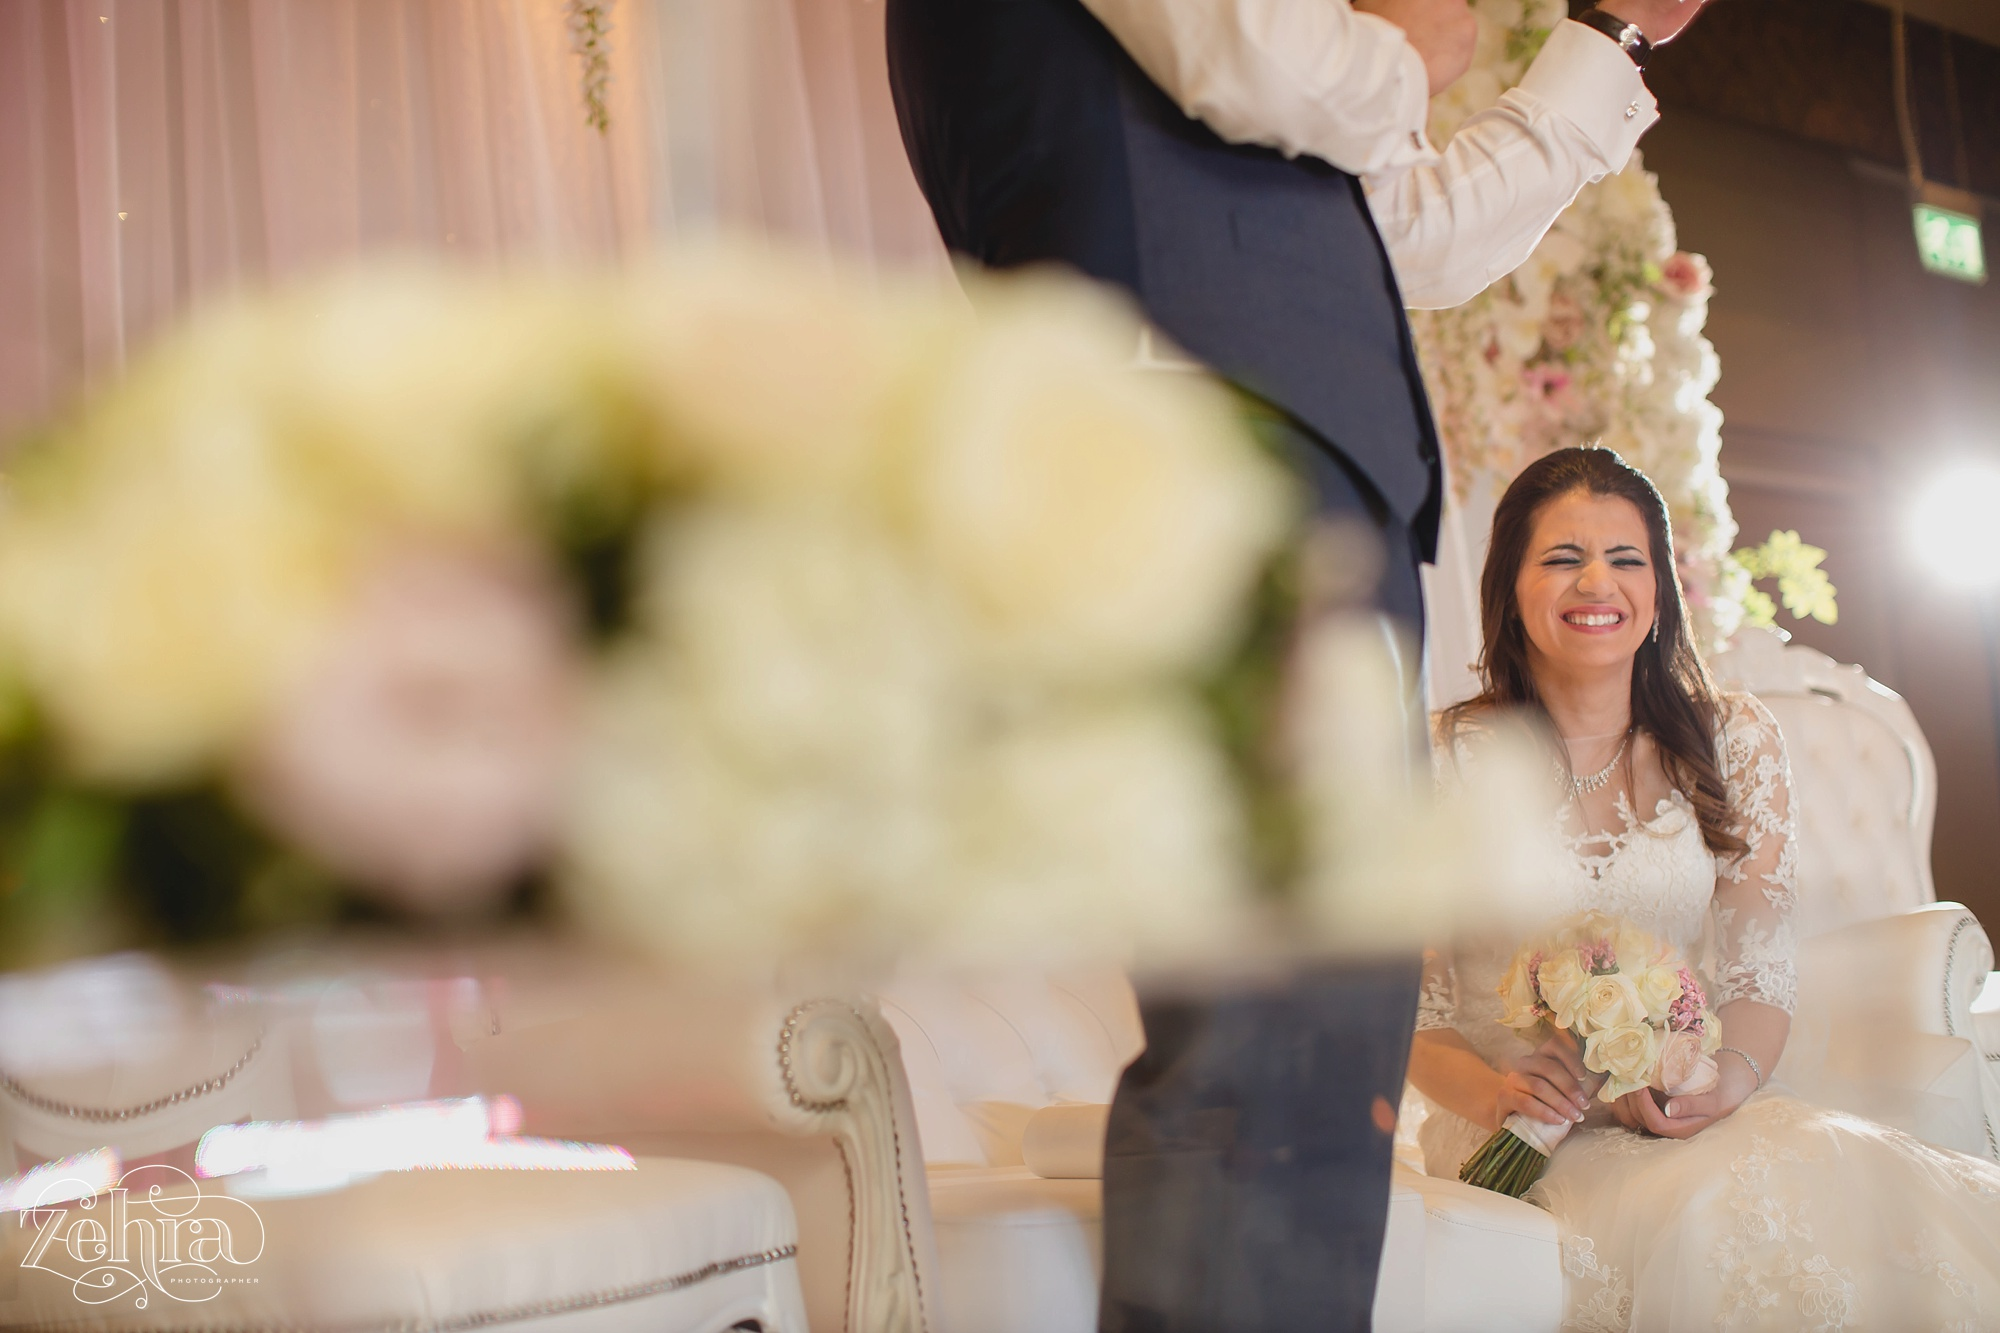 zehra photographer mere cheshire wedding_0058.jpg